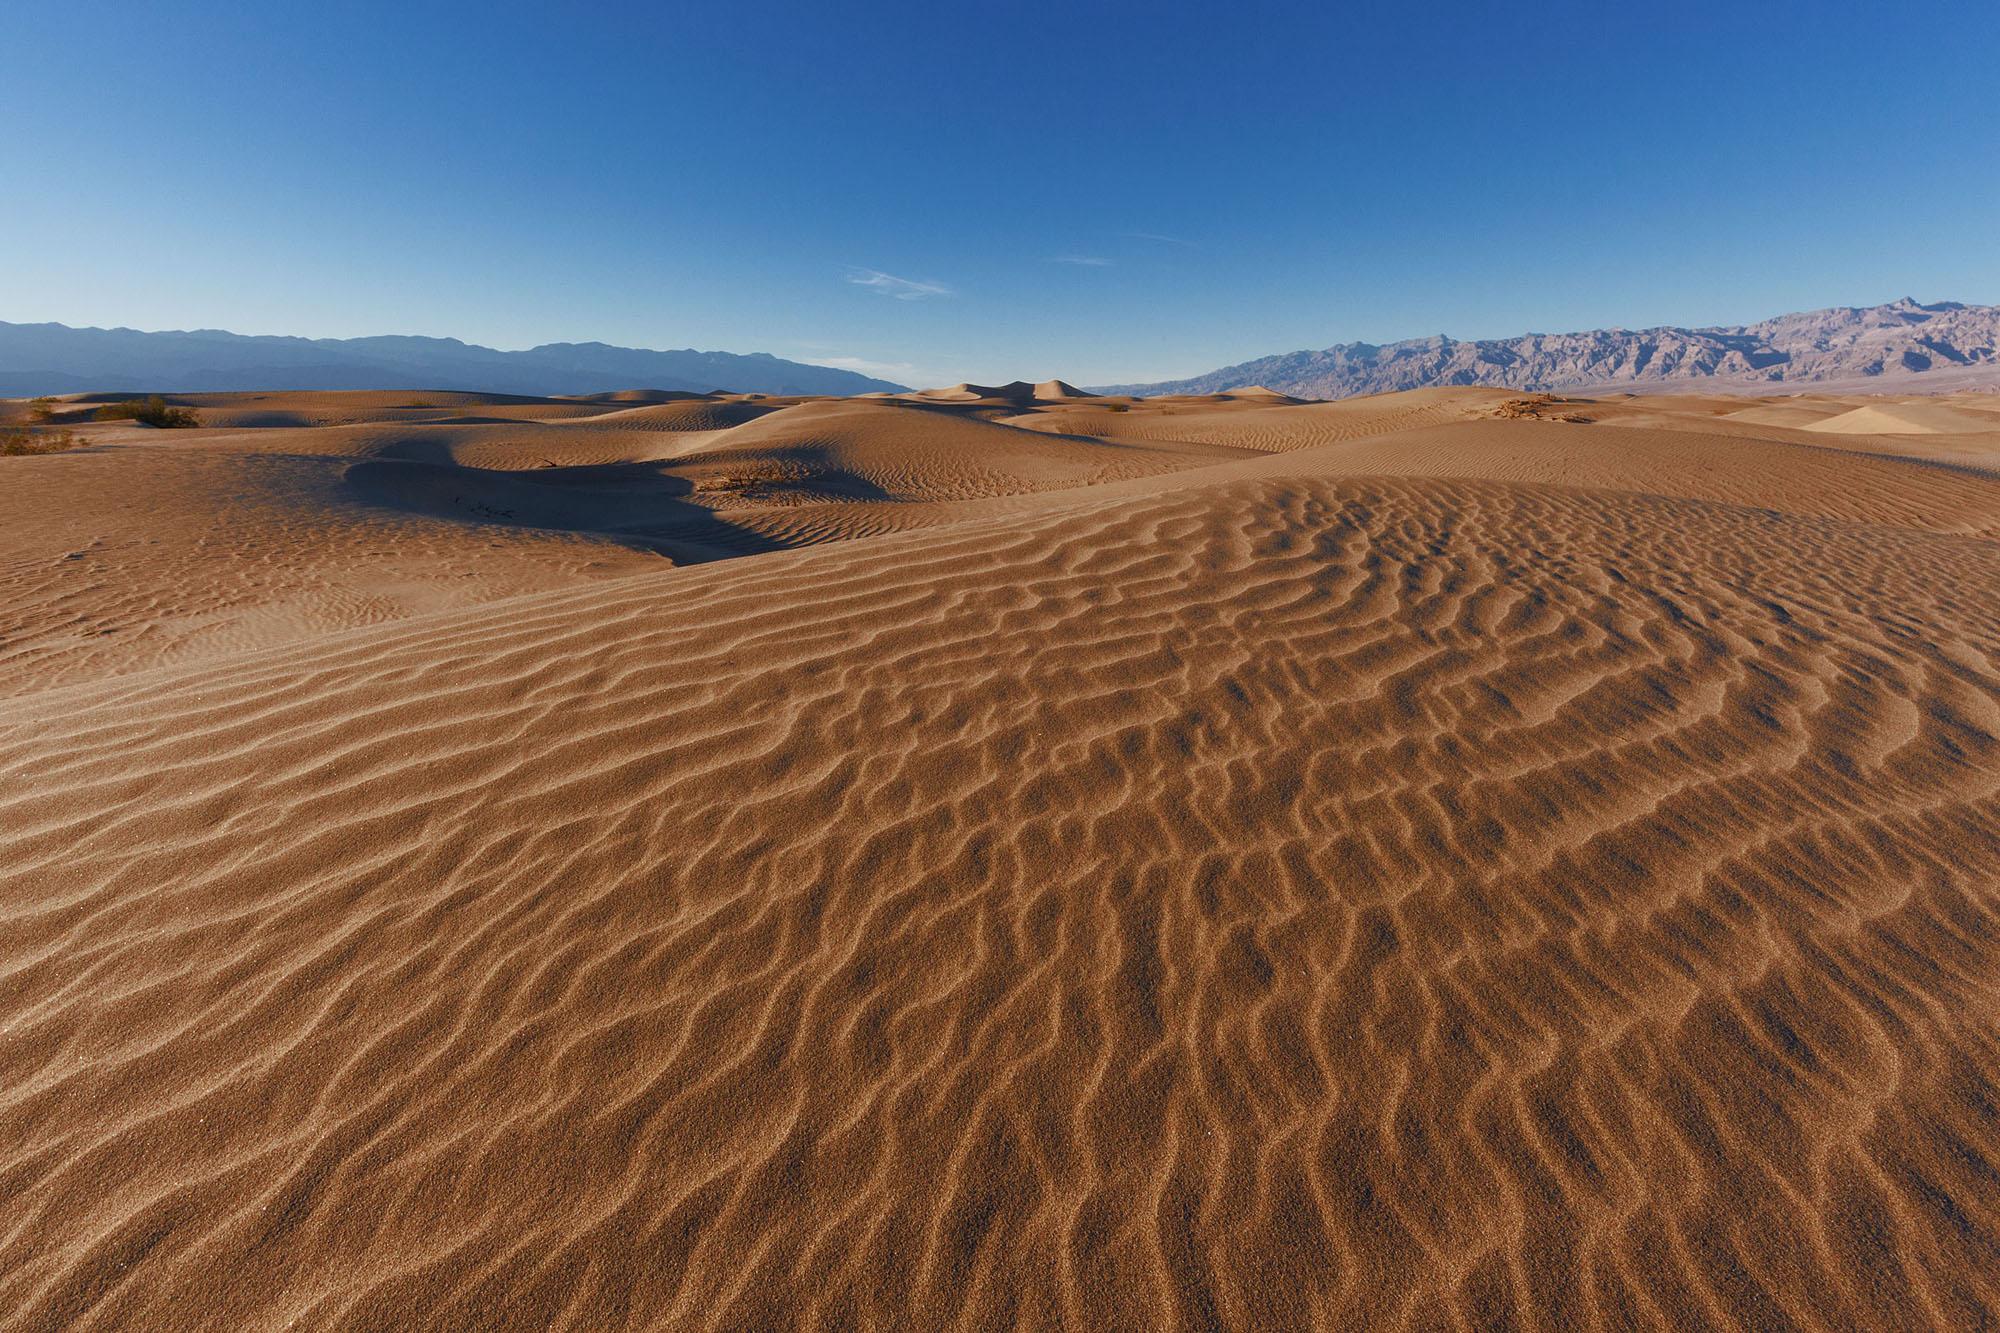 Spring Equinox at Death Valley 2017